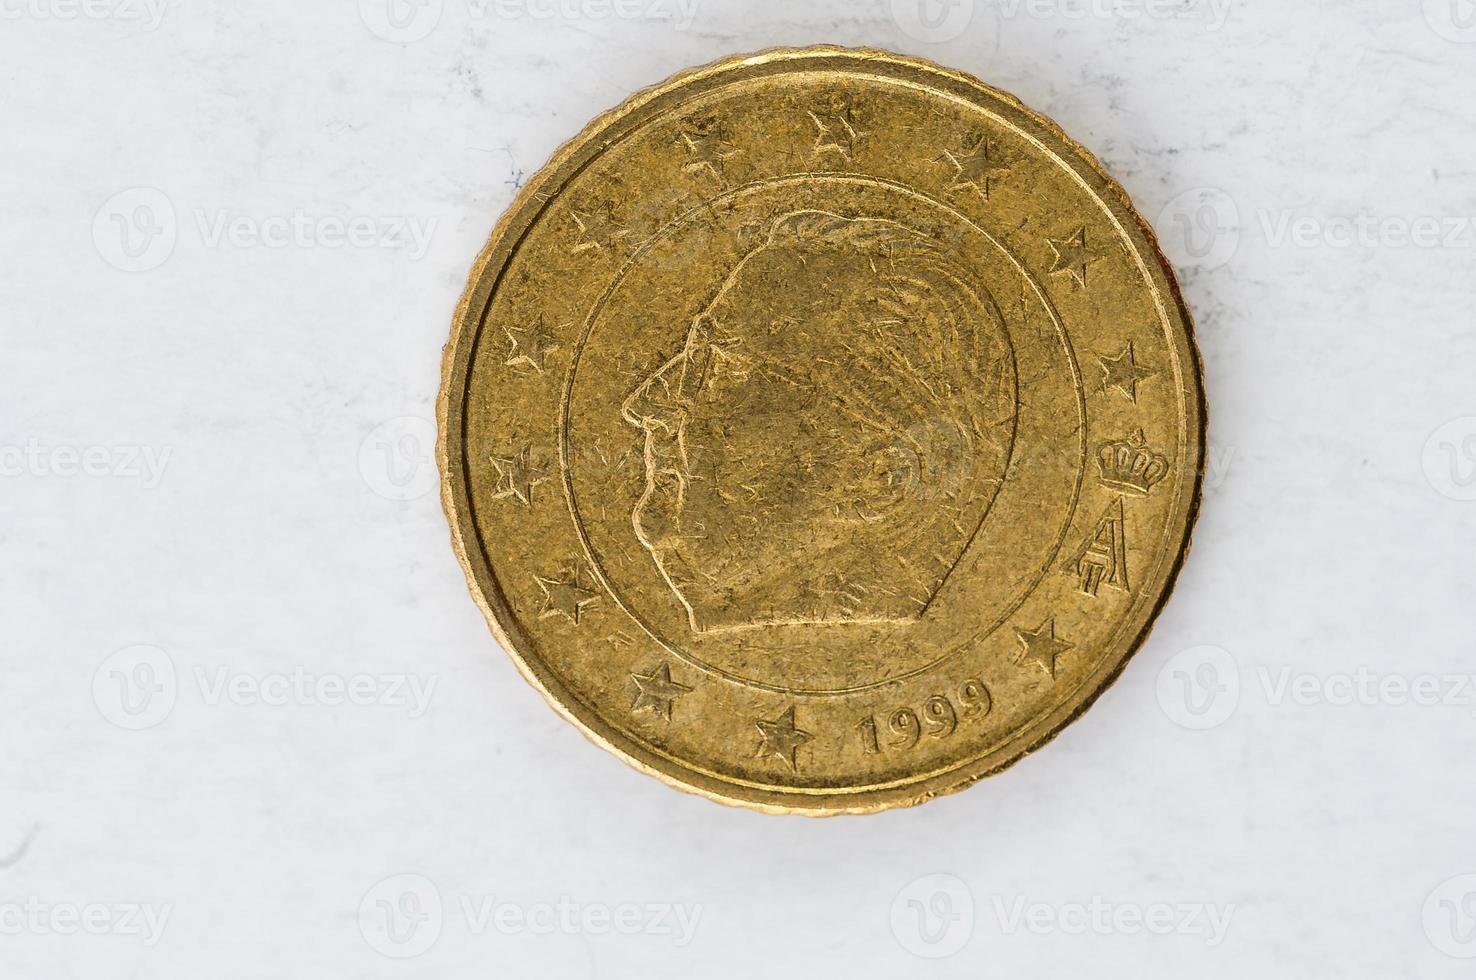 50-euromynt med belgisk baksida som används foto